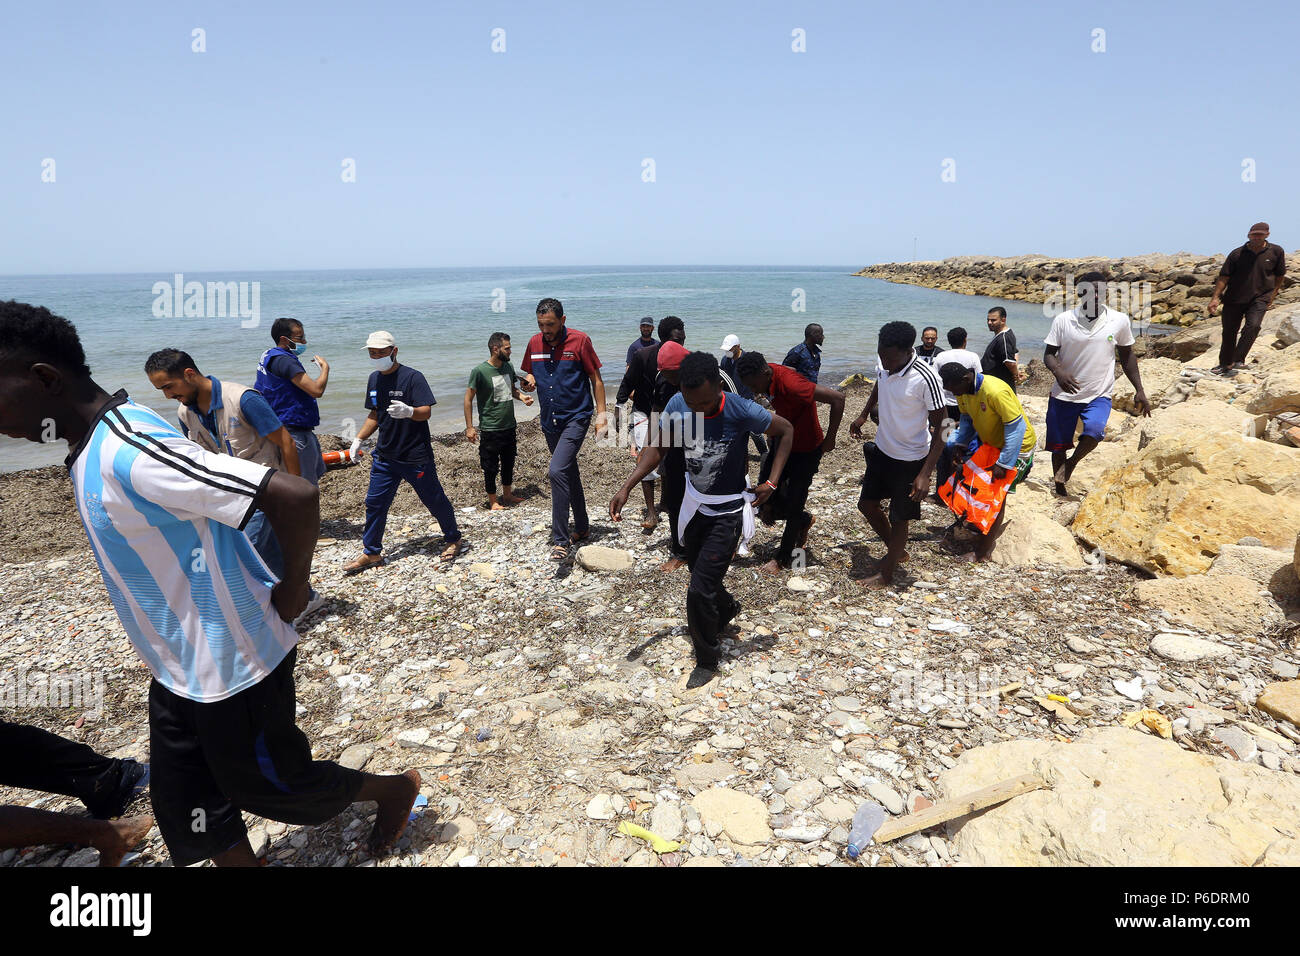 Tripoli  29th June, 2018  Rescued migrants go ashore at the